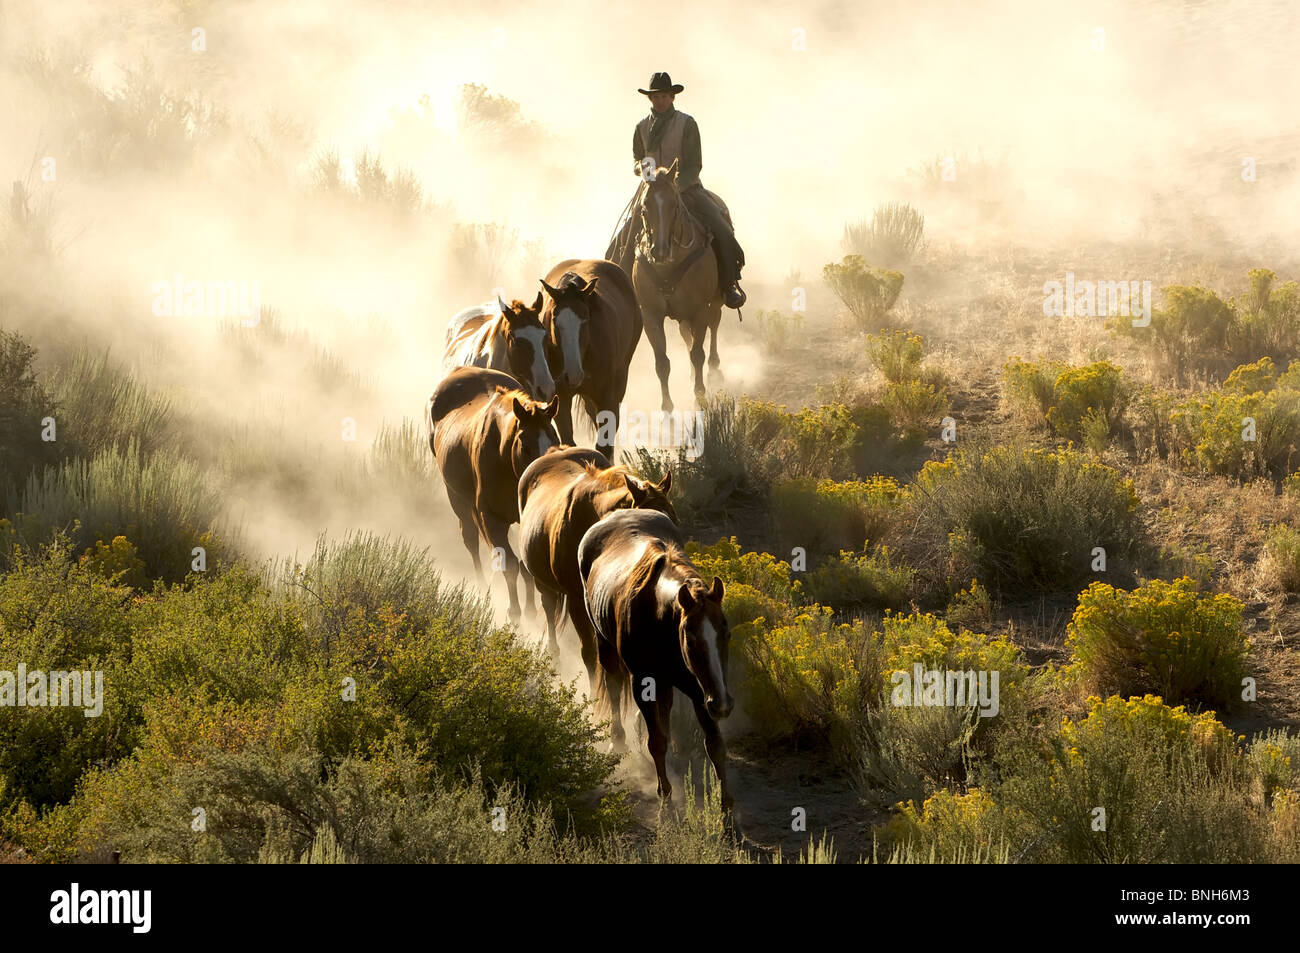 Single cowboy guiding a line of horses through the desert - Stock Image